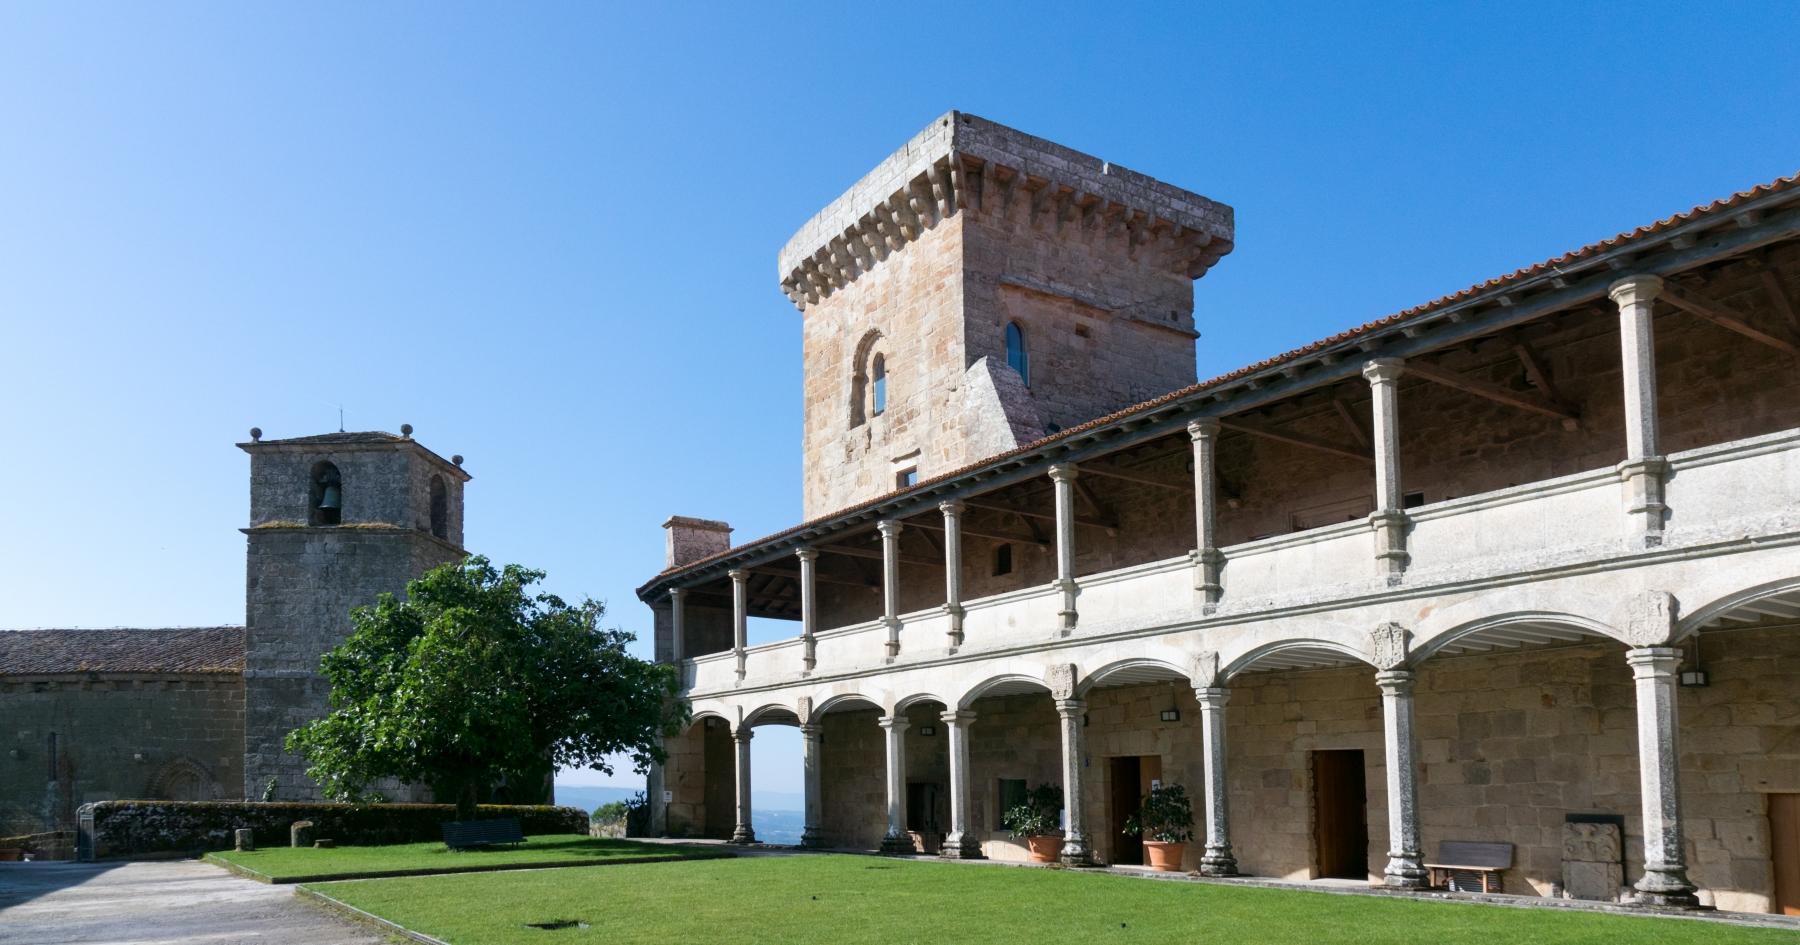 Castello de Monterrei_1.psd. x